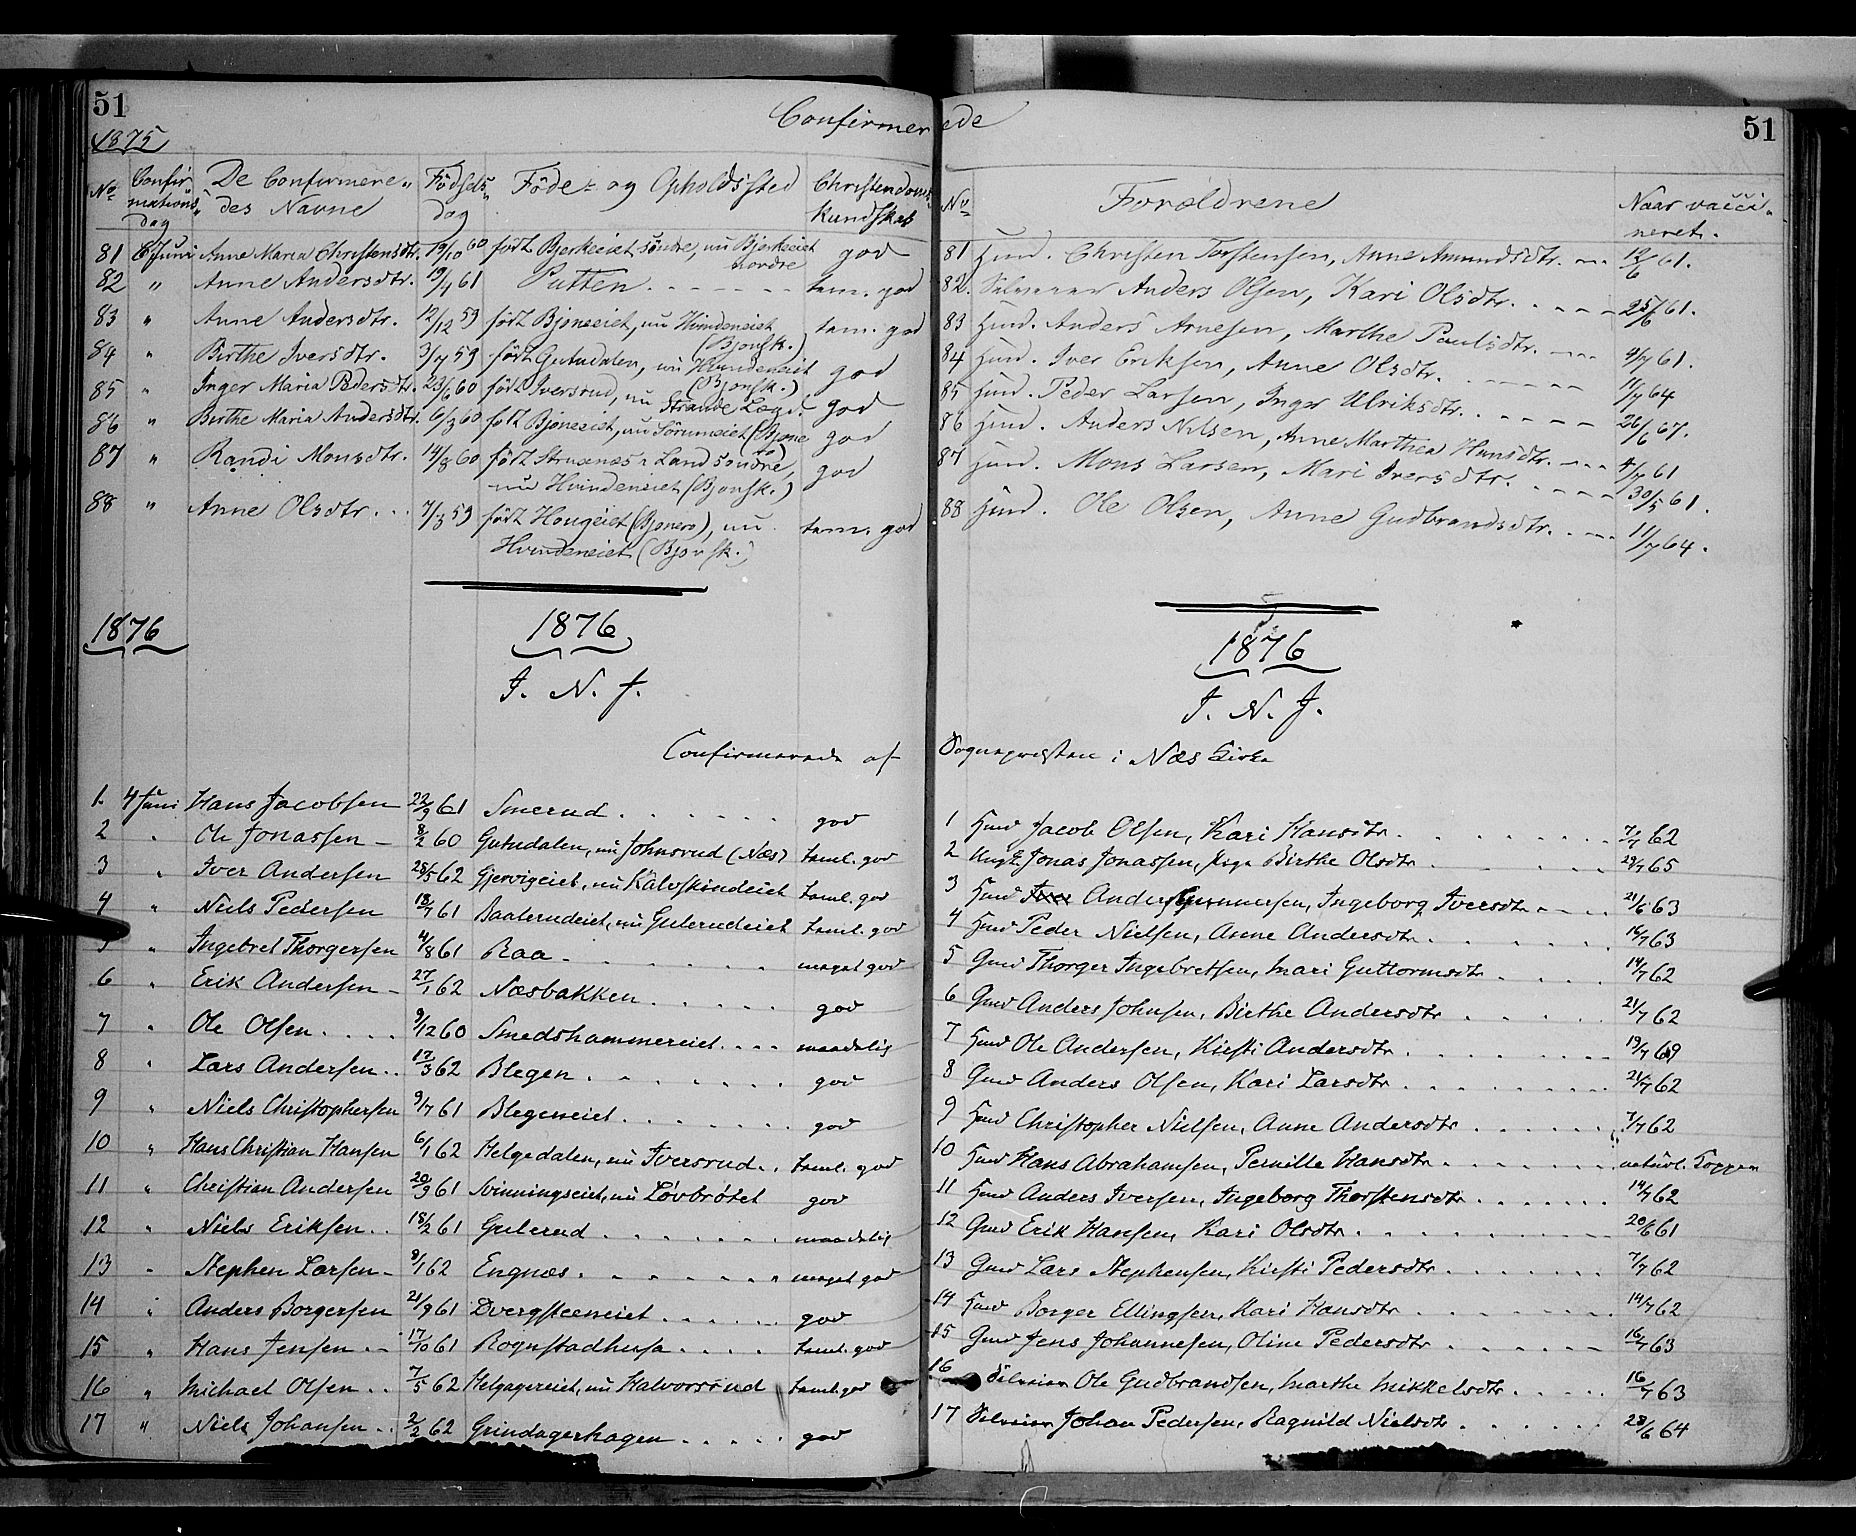 SAH, Gran prestekontor, Ministerialbok nr. 13, 1875-1879, s. 51